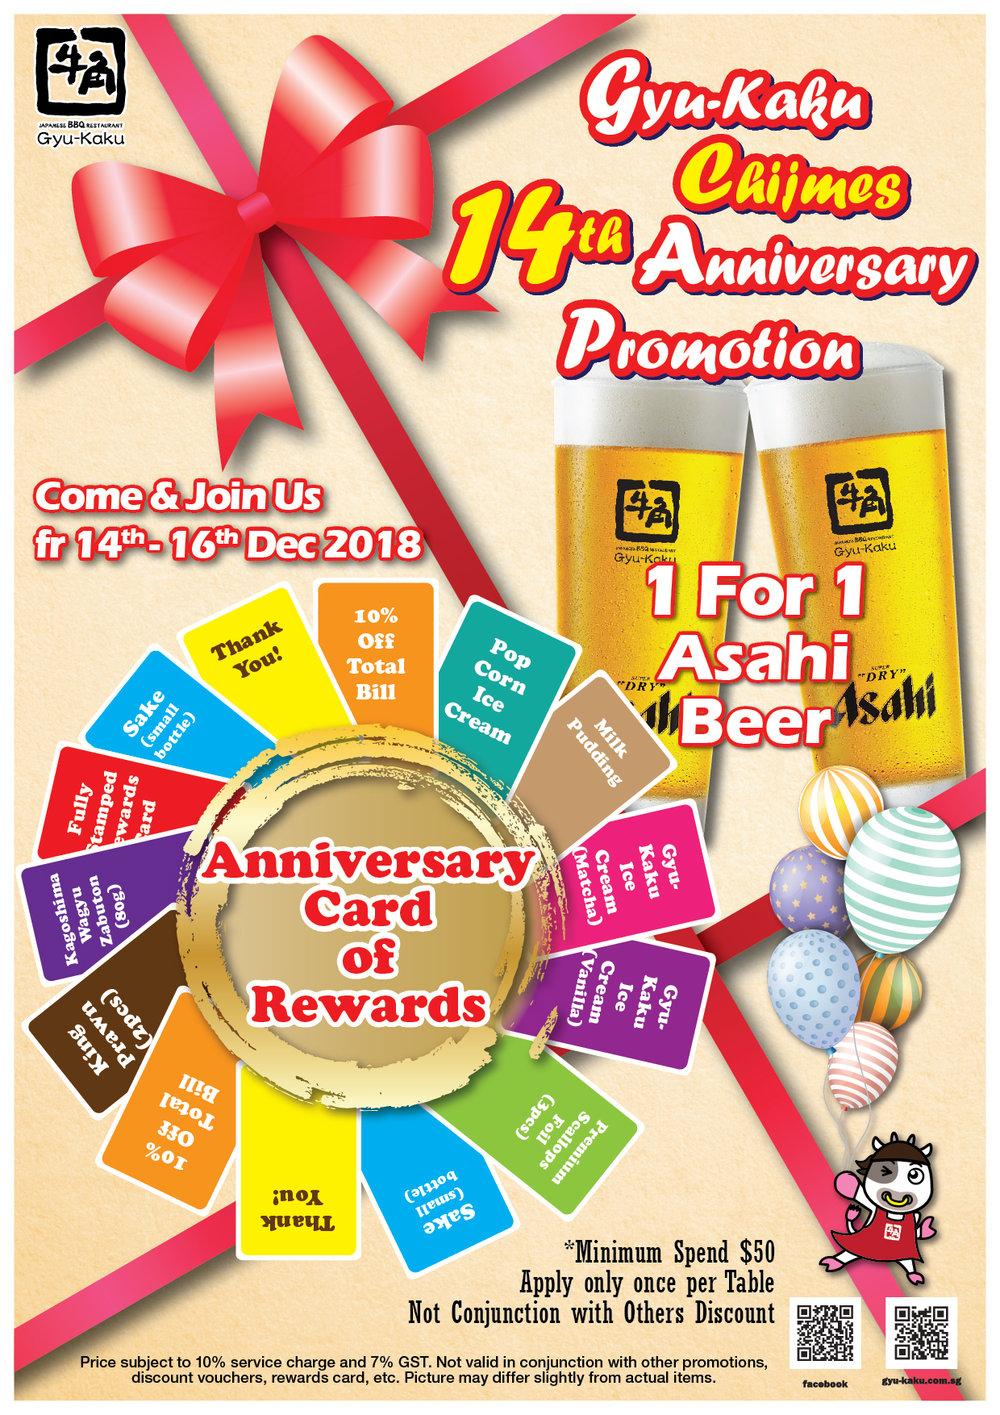 Promo_Anniversary_CH_A4-01.jpg